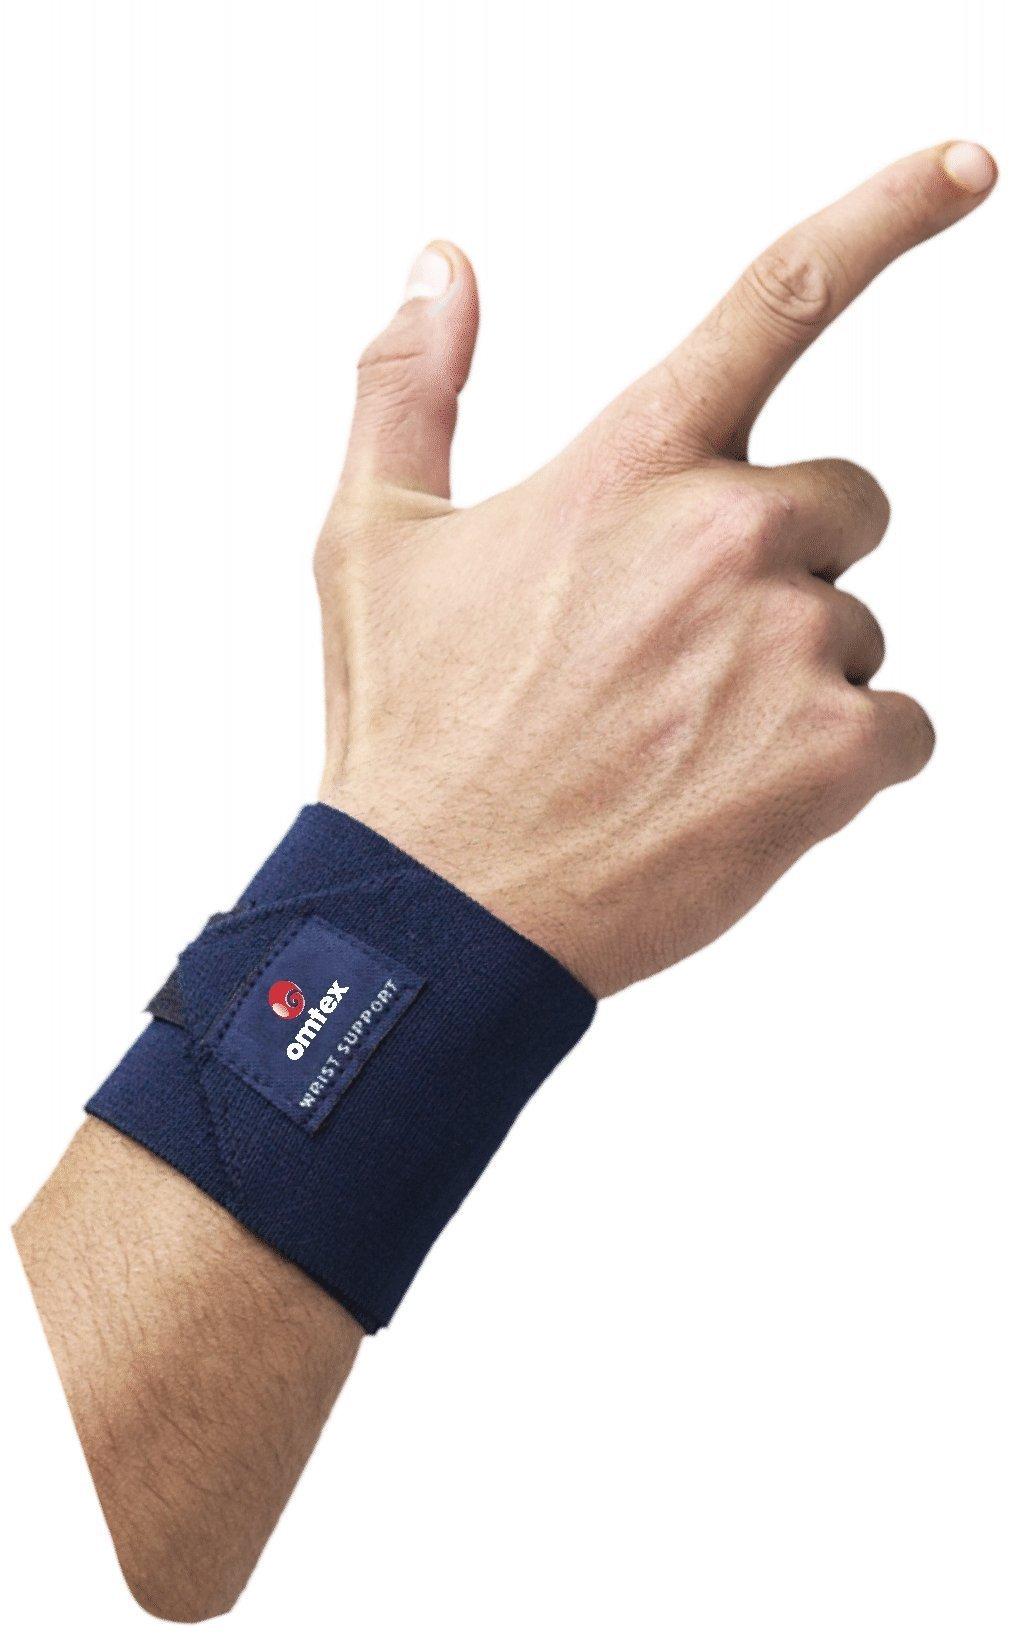 Omtex Adjustable Velcro Elasticized-Fabric Wrist Support, Men's Free Size (Navy Blue) product image